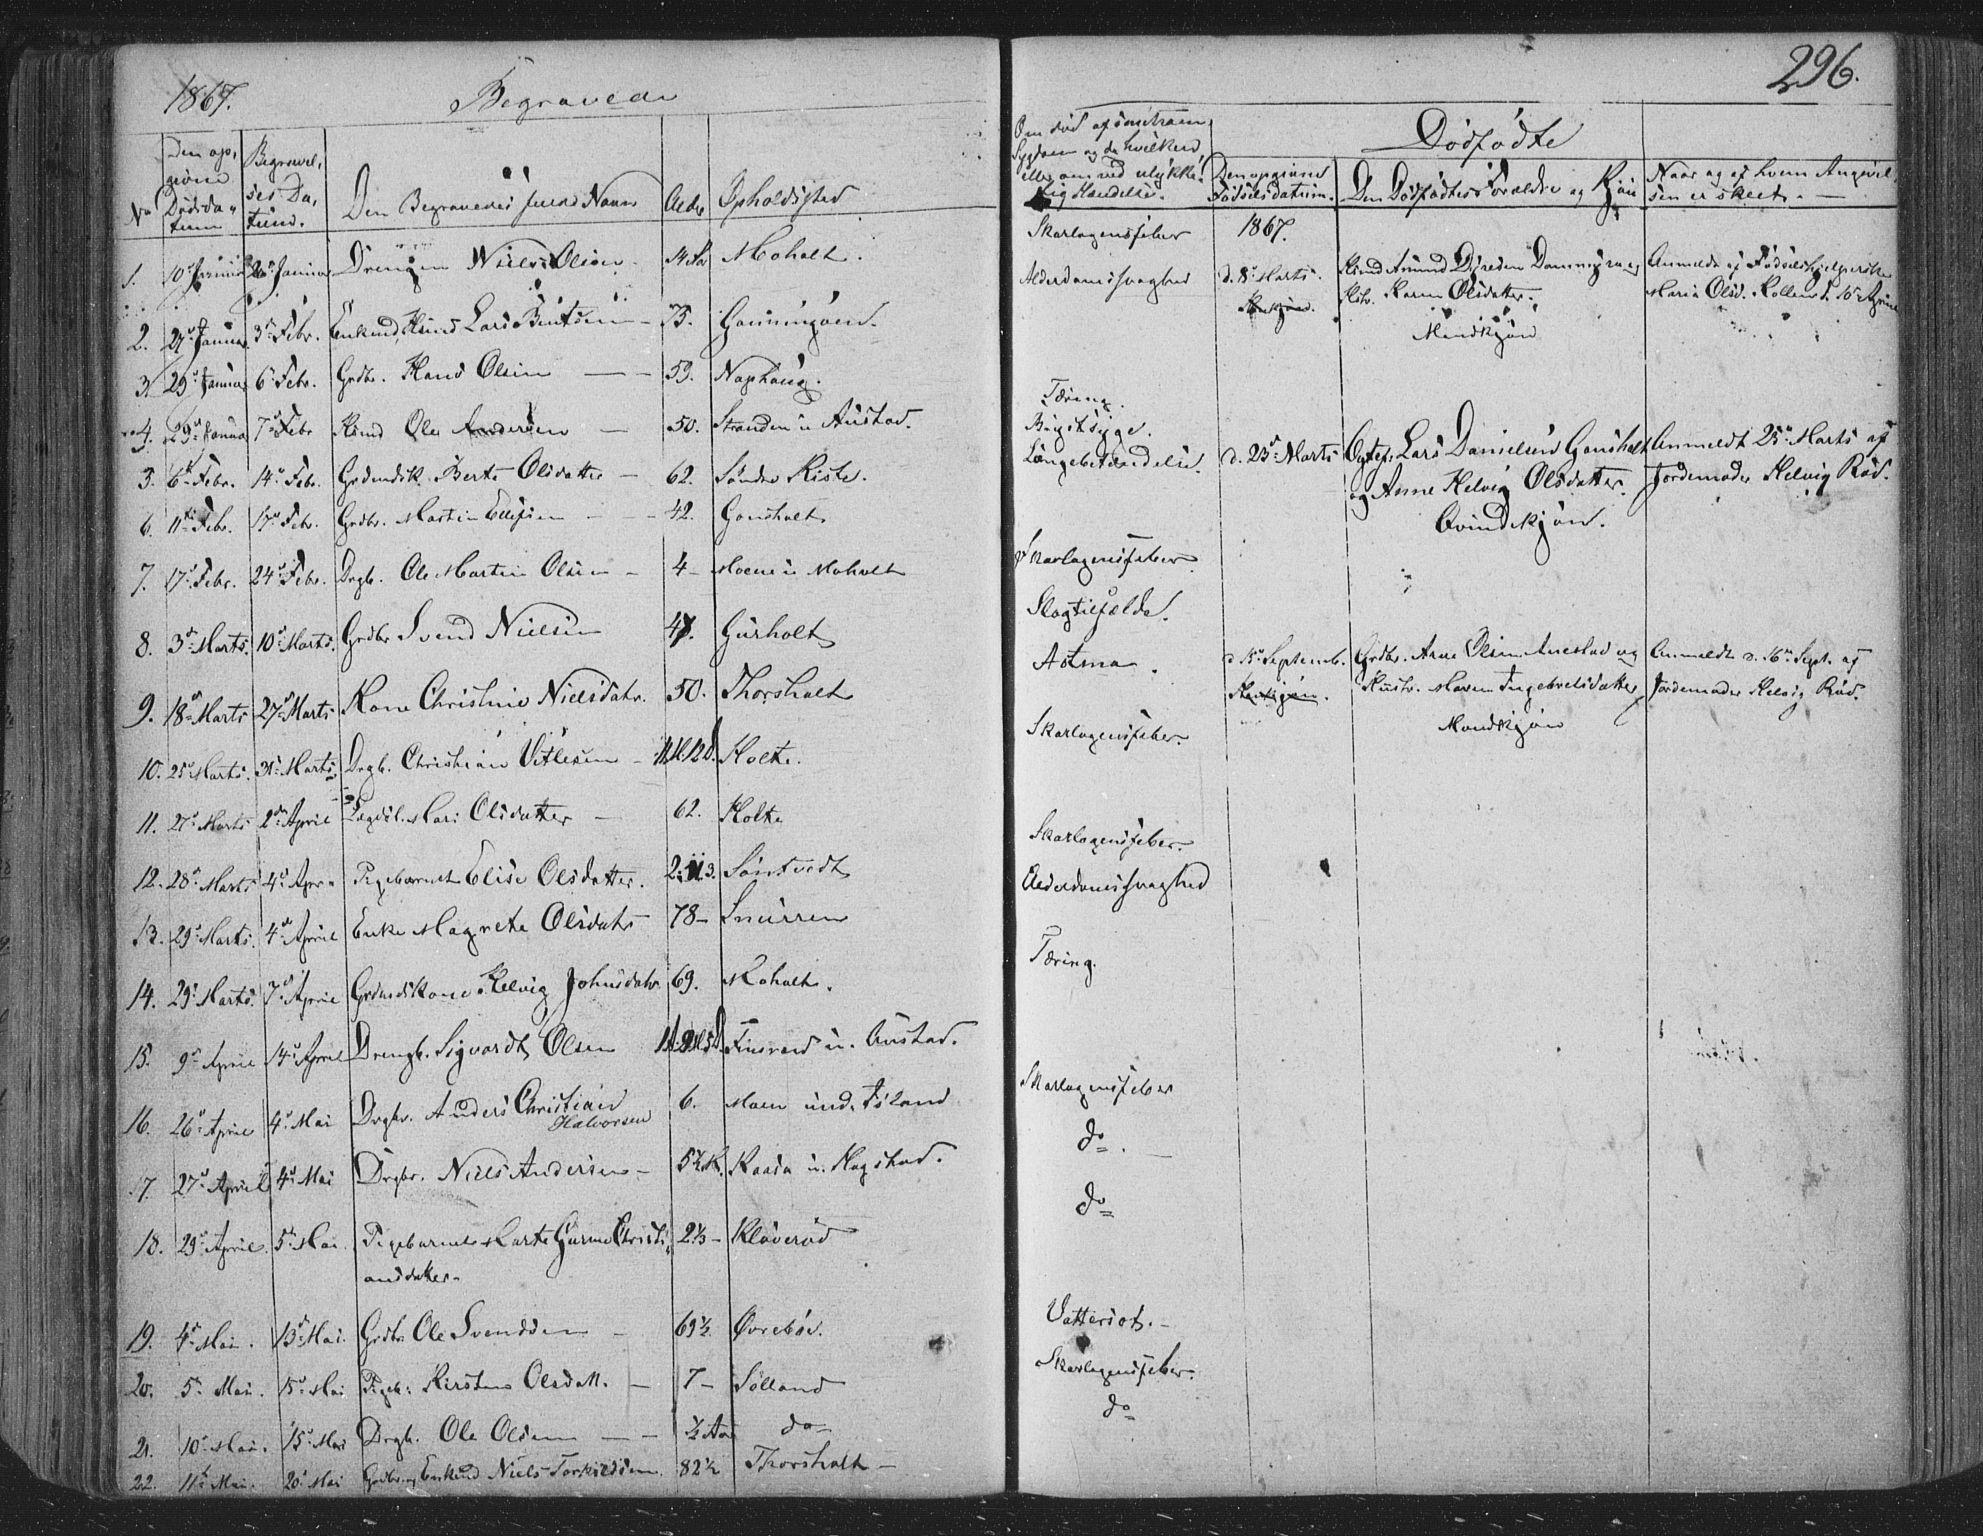 SAKO, Siljan kirkebøker, F/Fa/L0001: Parish register (official) no. 1, 1831-1870, p. 296